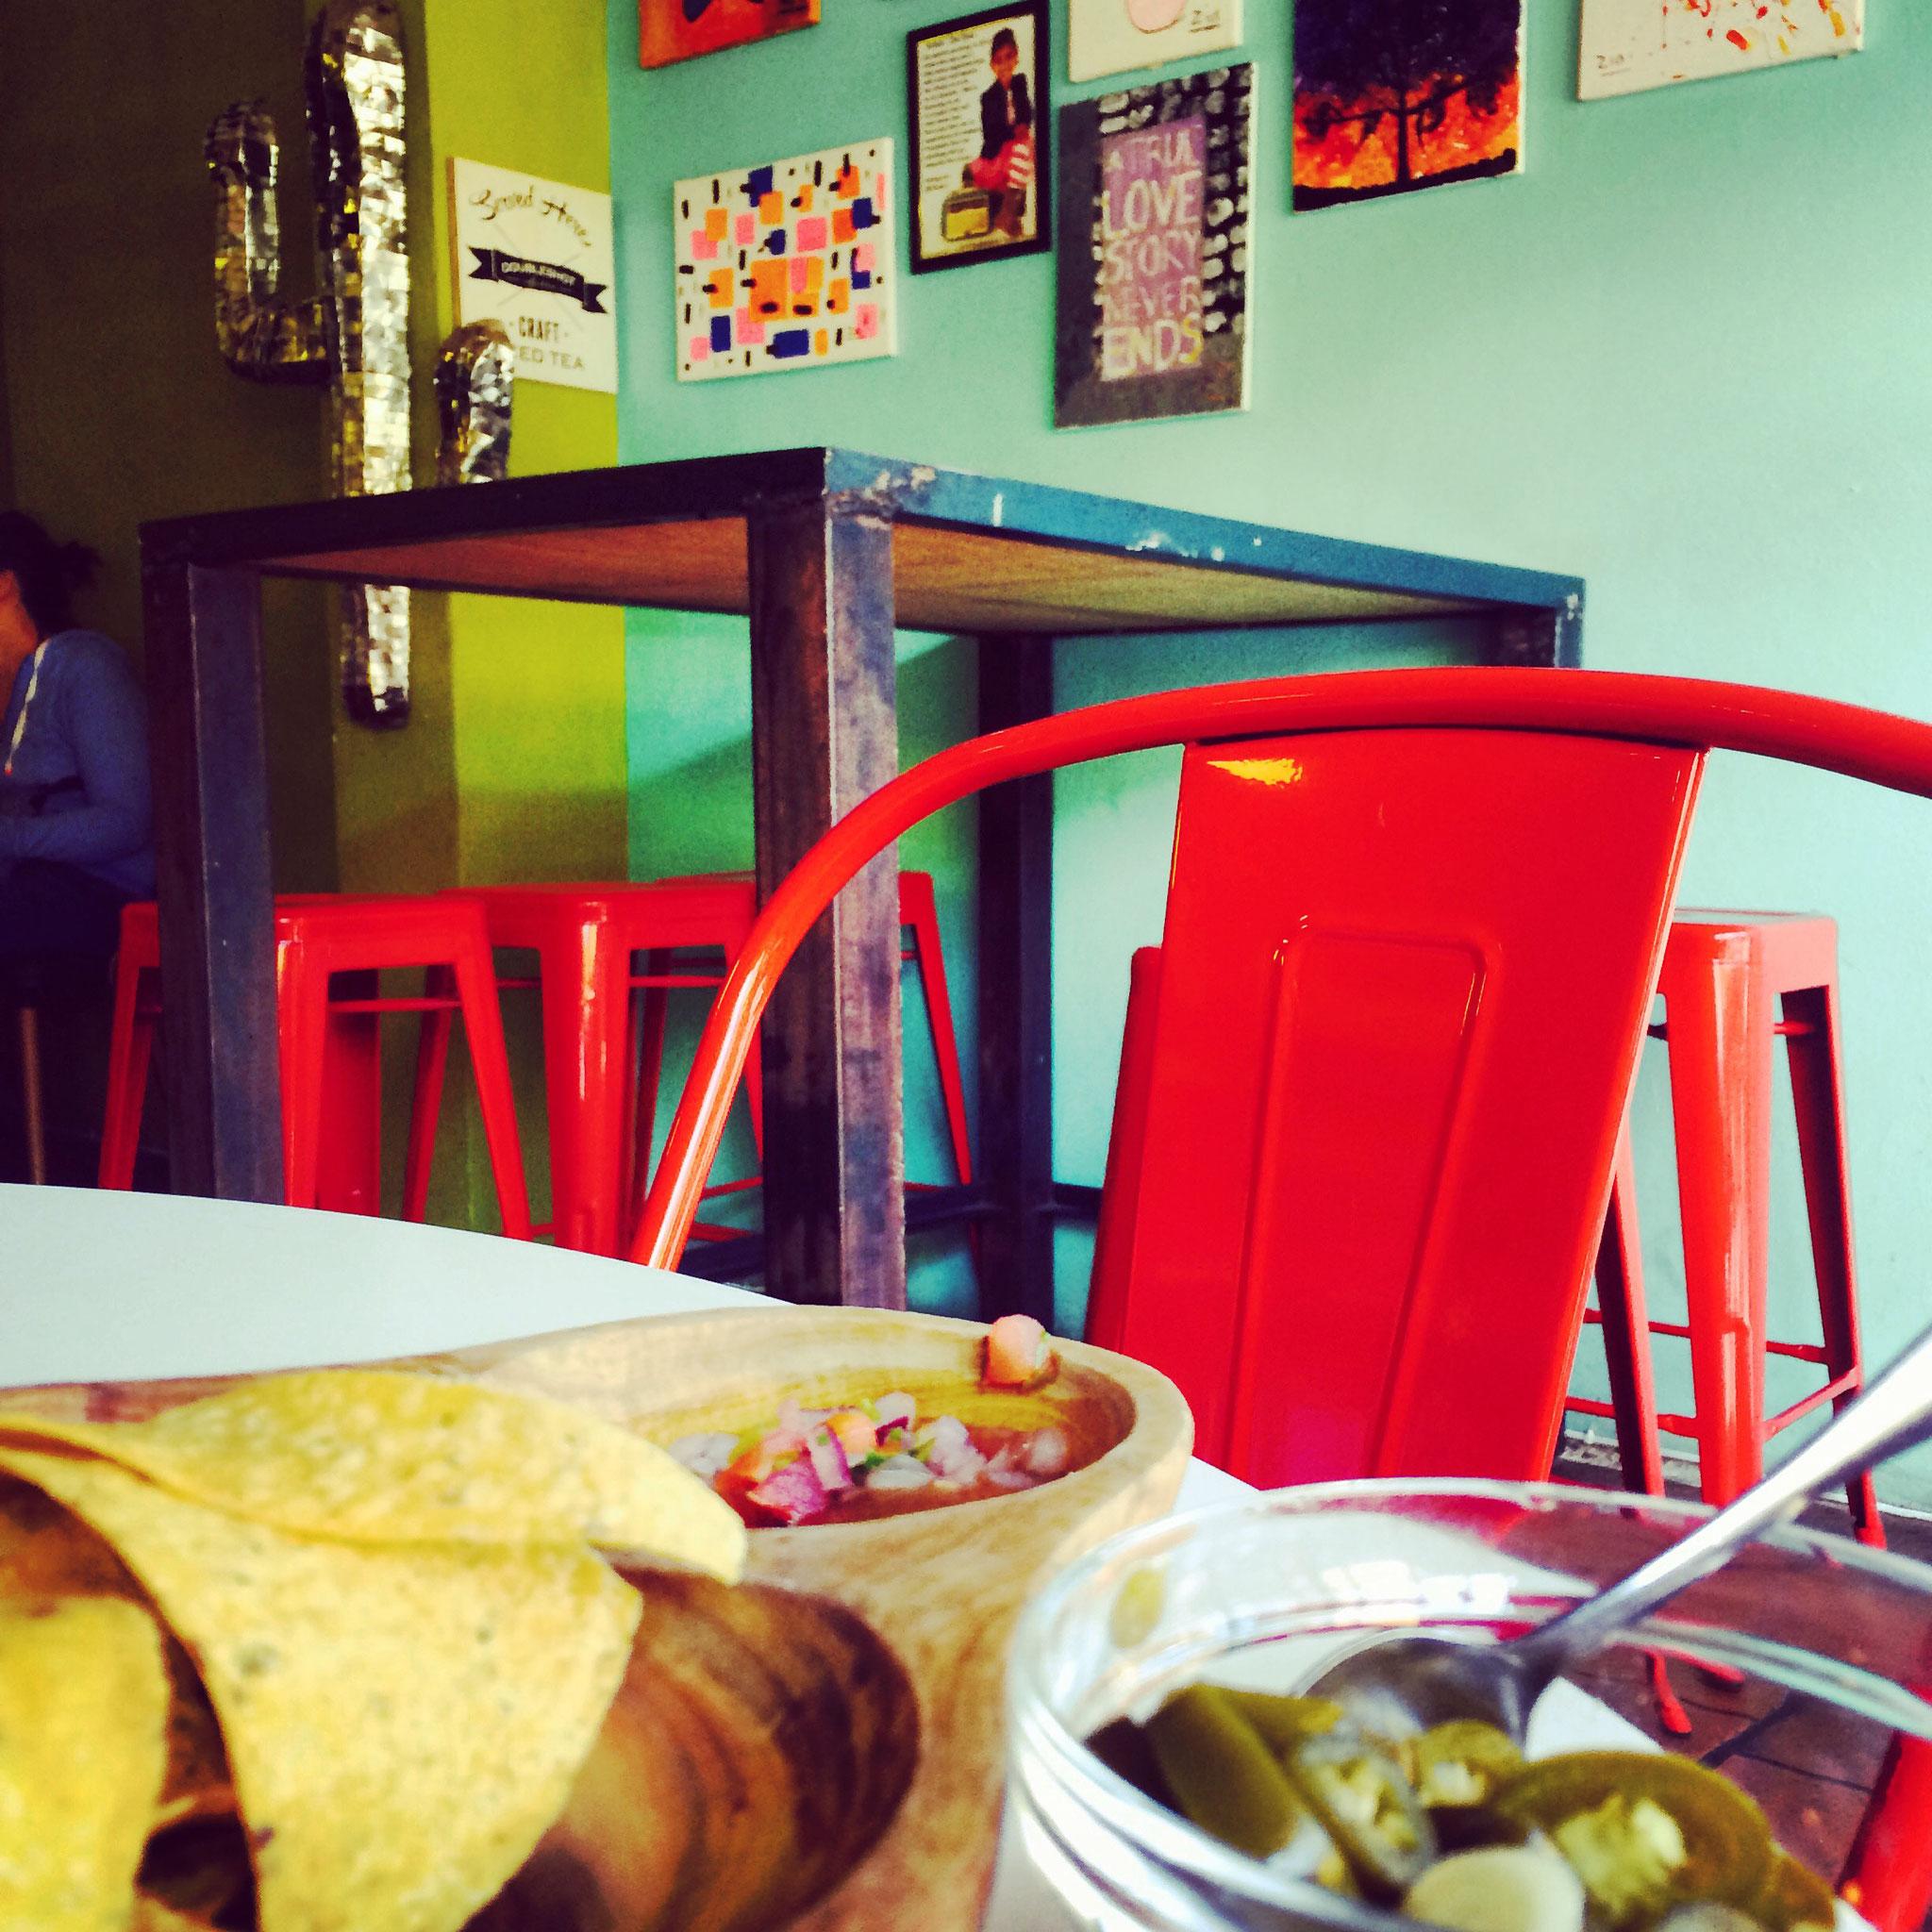 Mexican take aways at Baha Taco. Delicious!